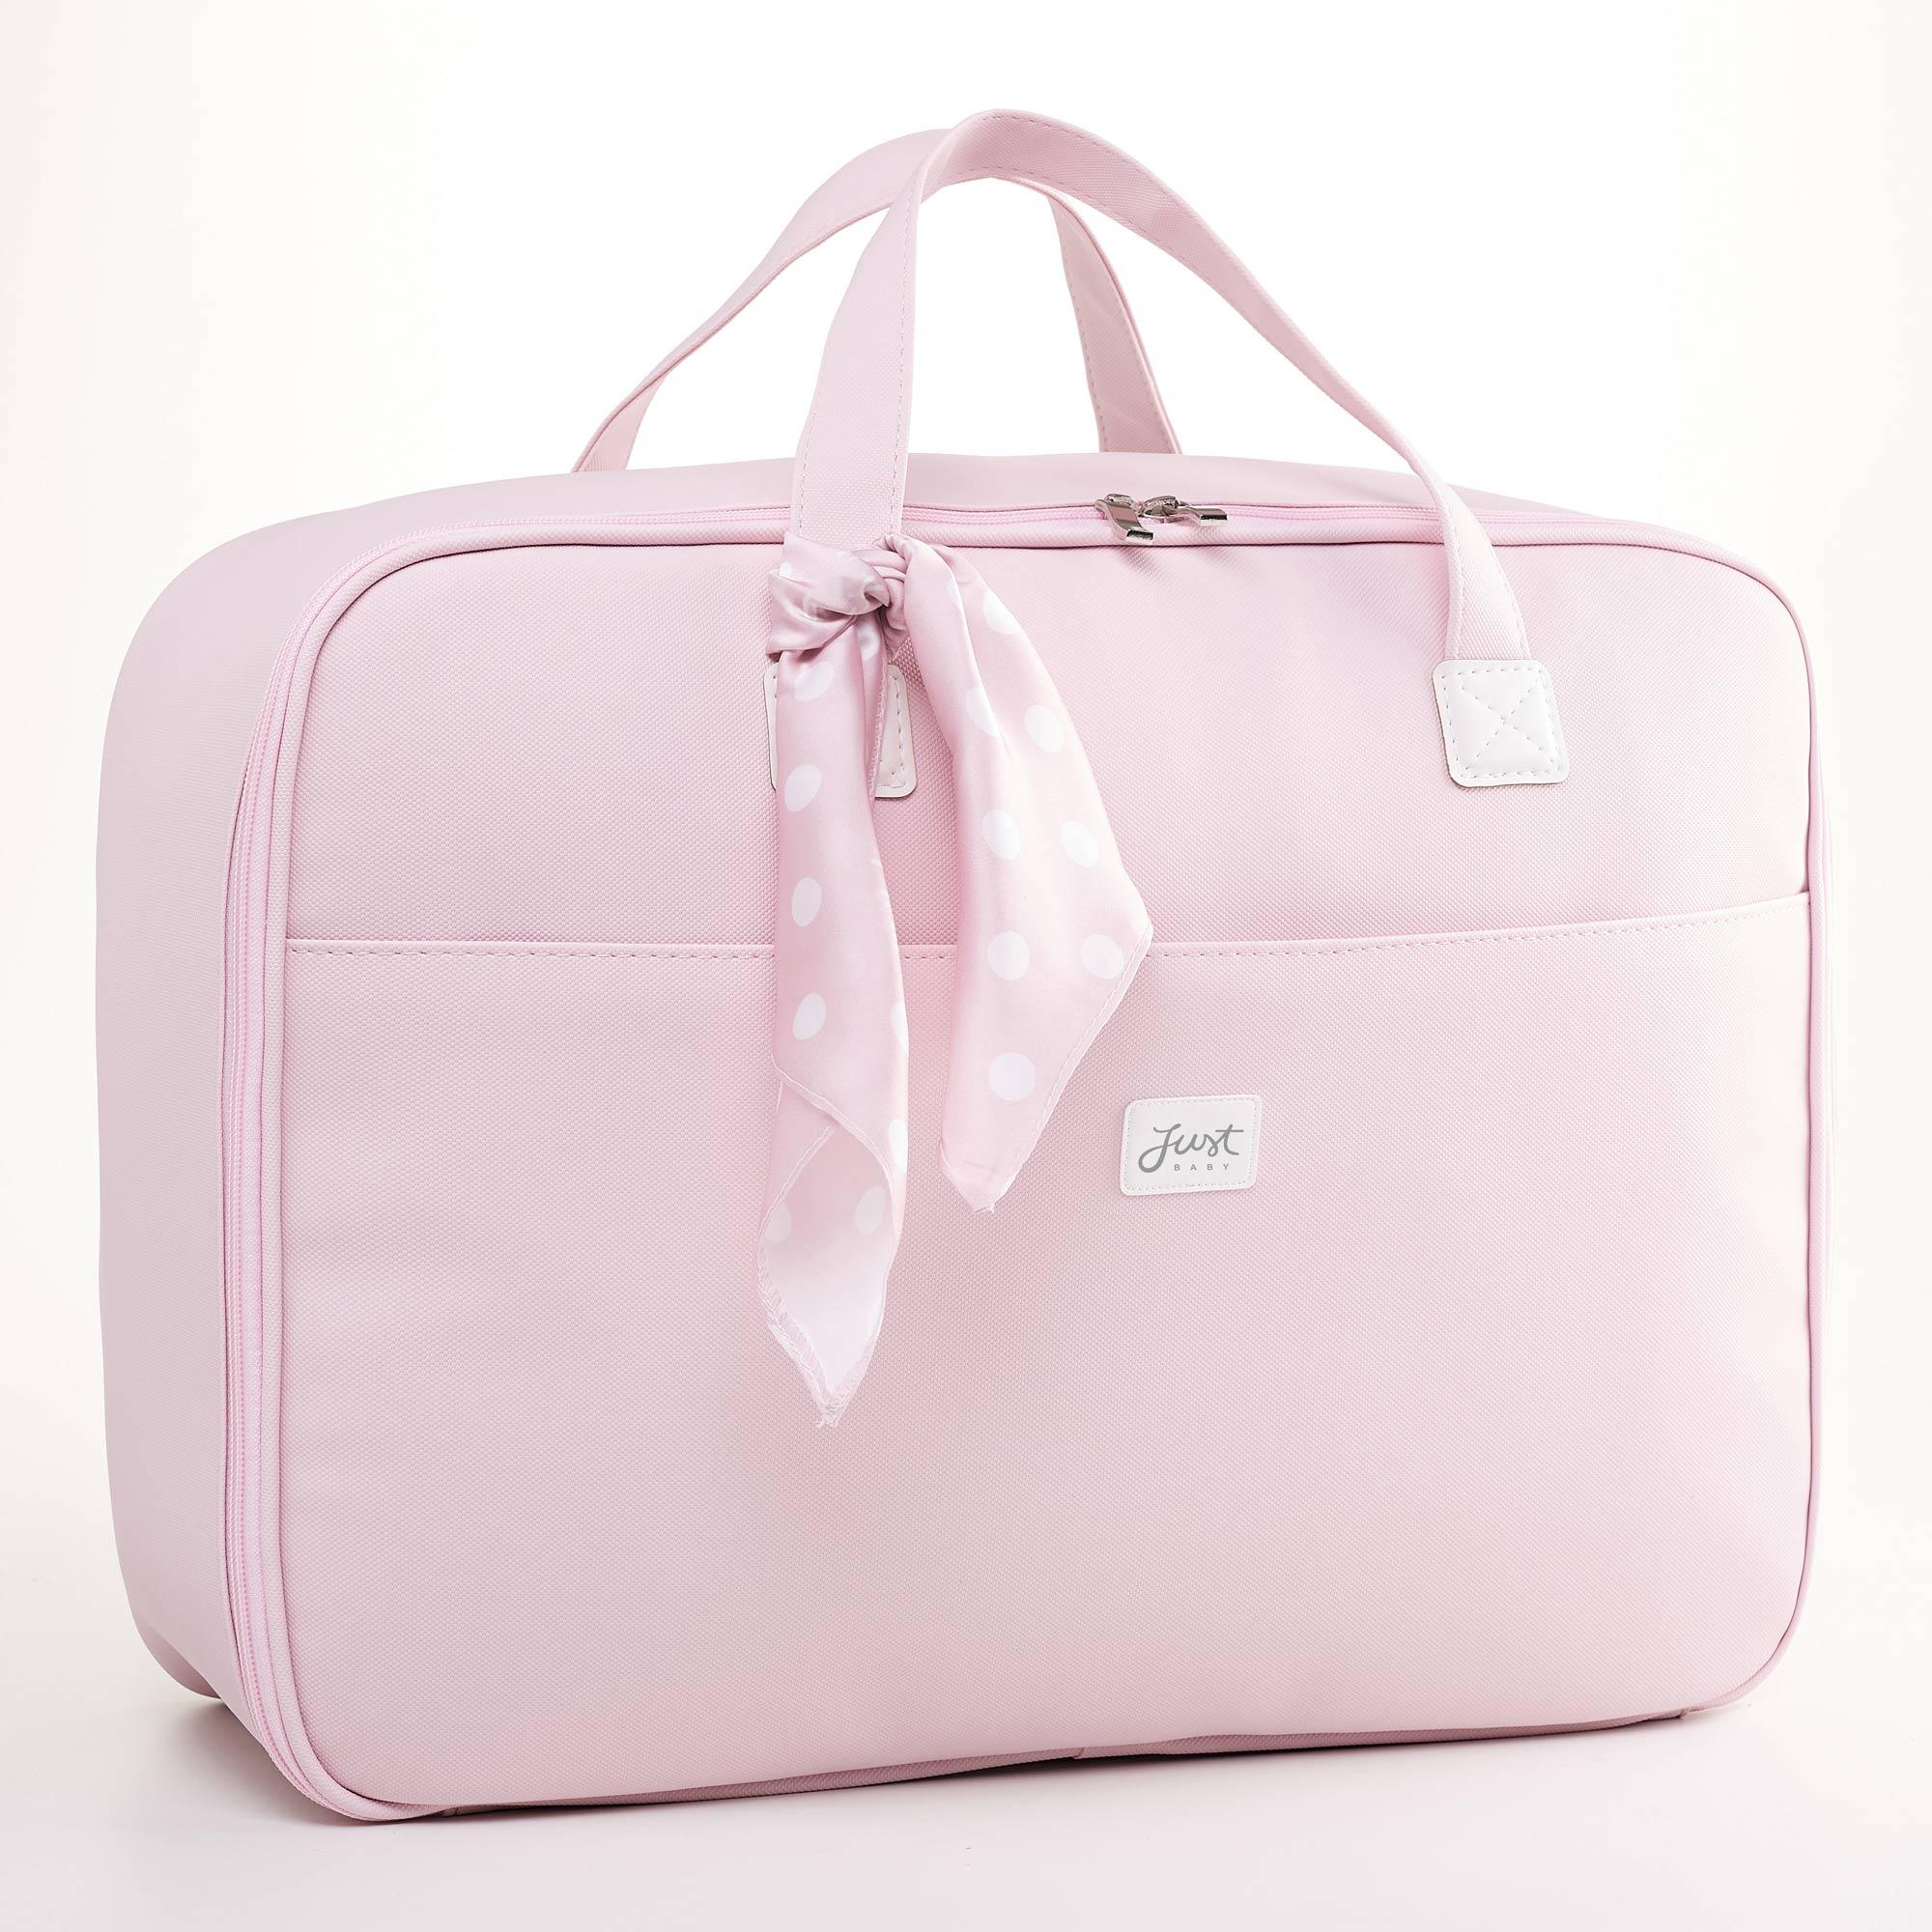 Mala maternidade candy rosa